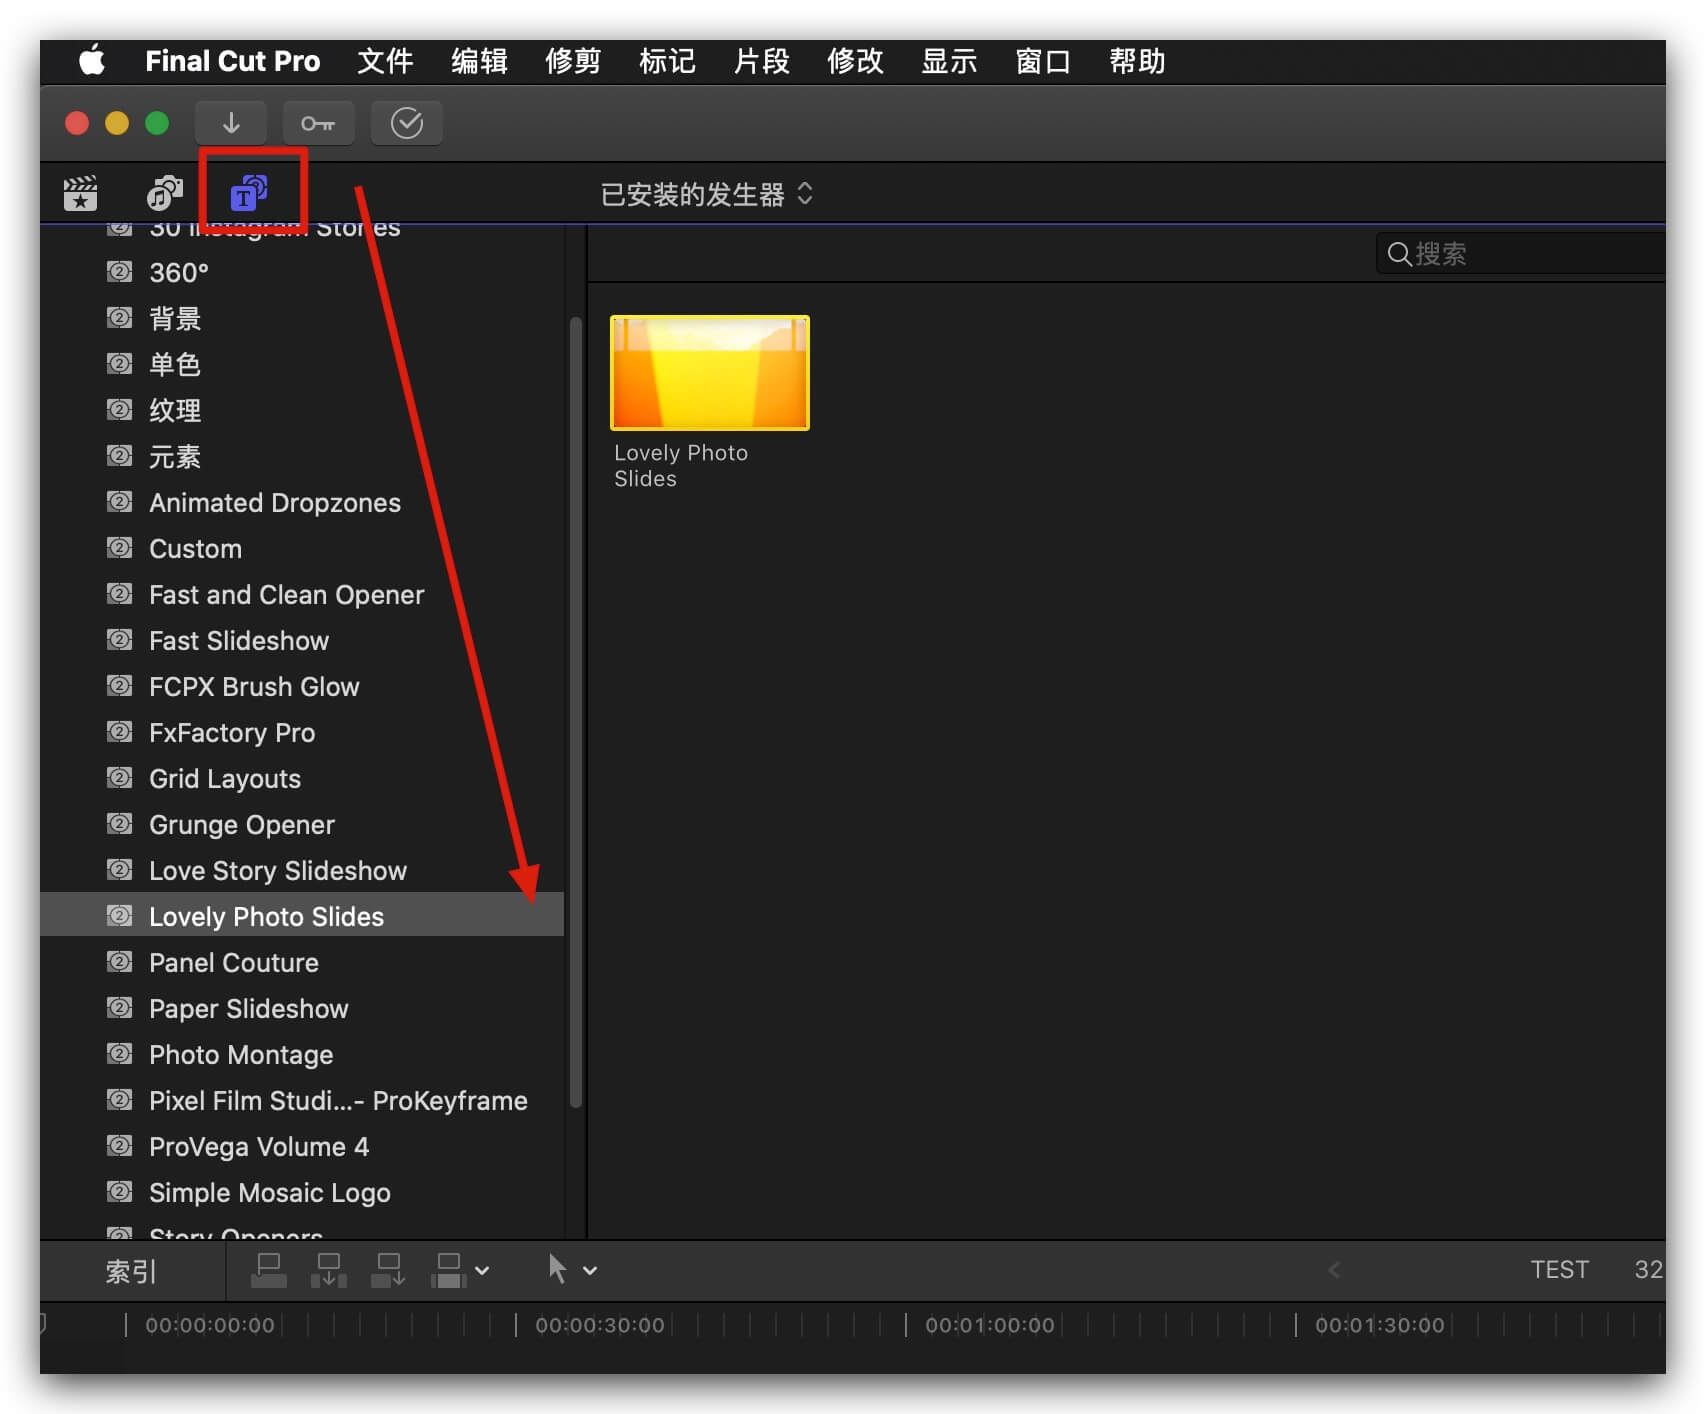 fcpx主题插件 电影胶片风格图片视频展示模板 Lovely Photo Slides